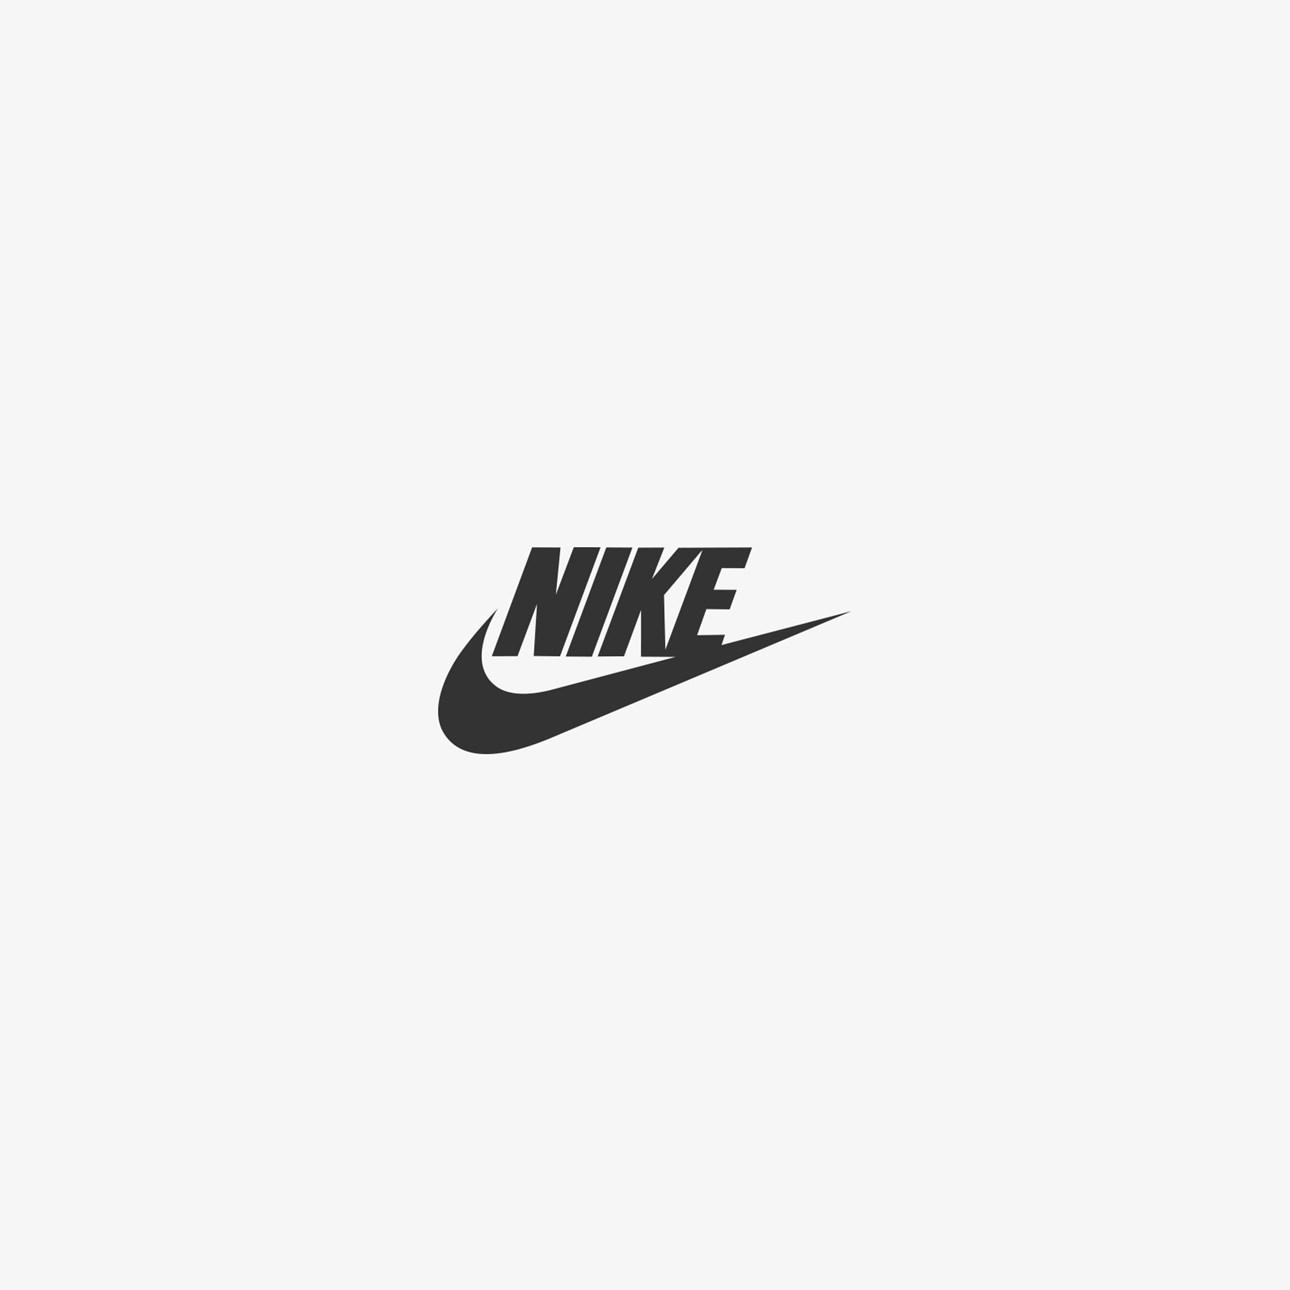 Nike Sportswear Air Max 95 x Carhartt WIP